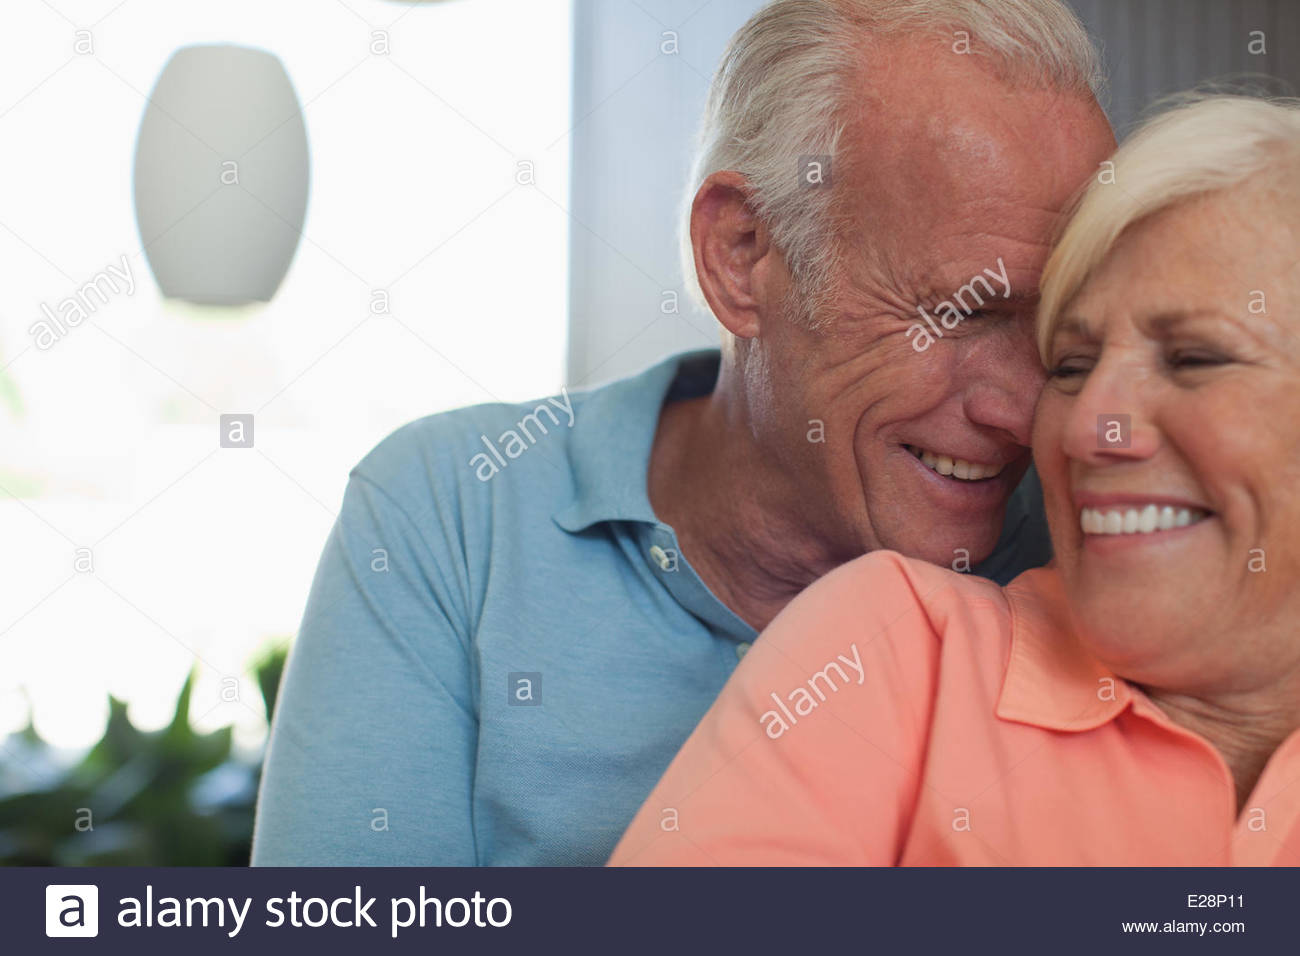 Smiling older couple sitting together - Stock Image